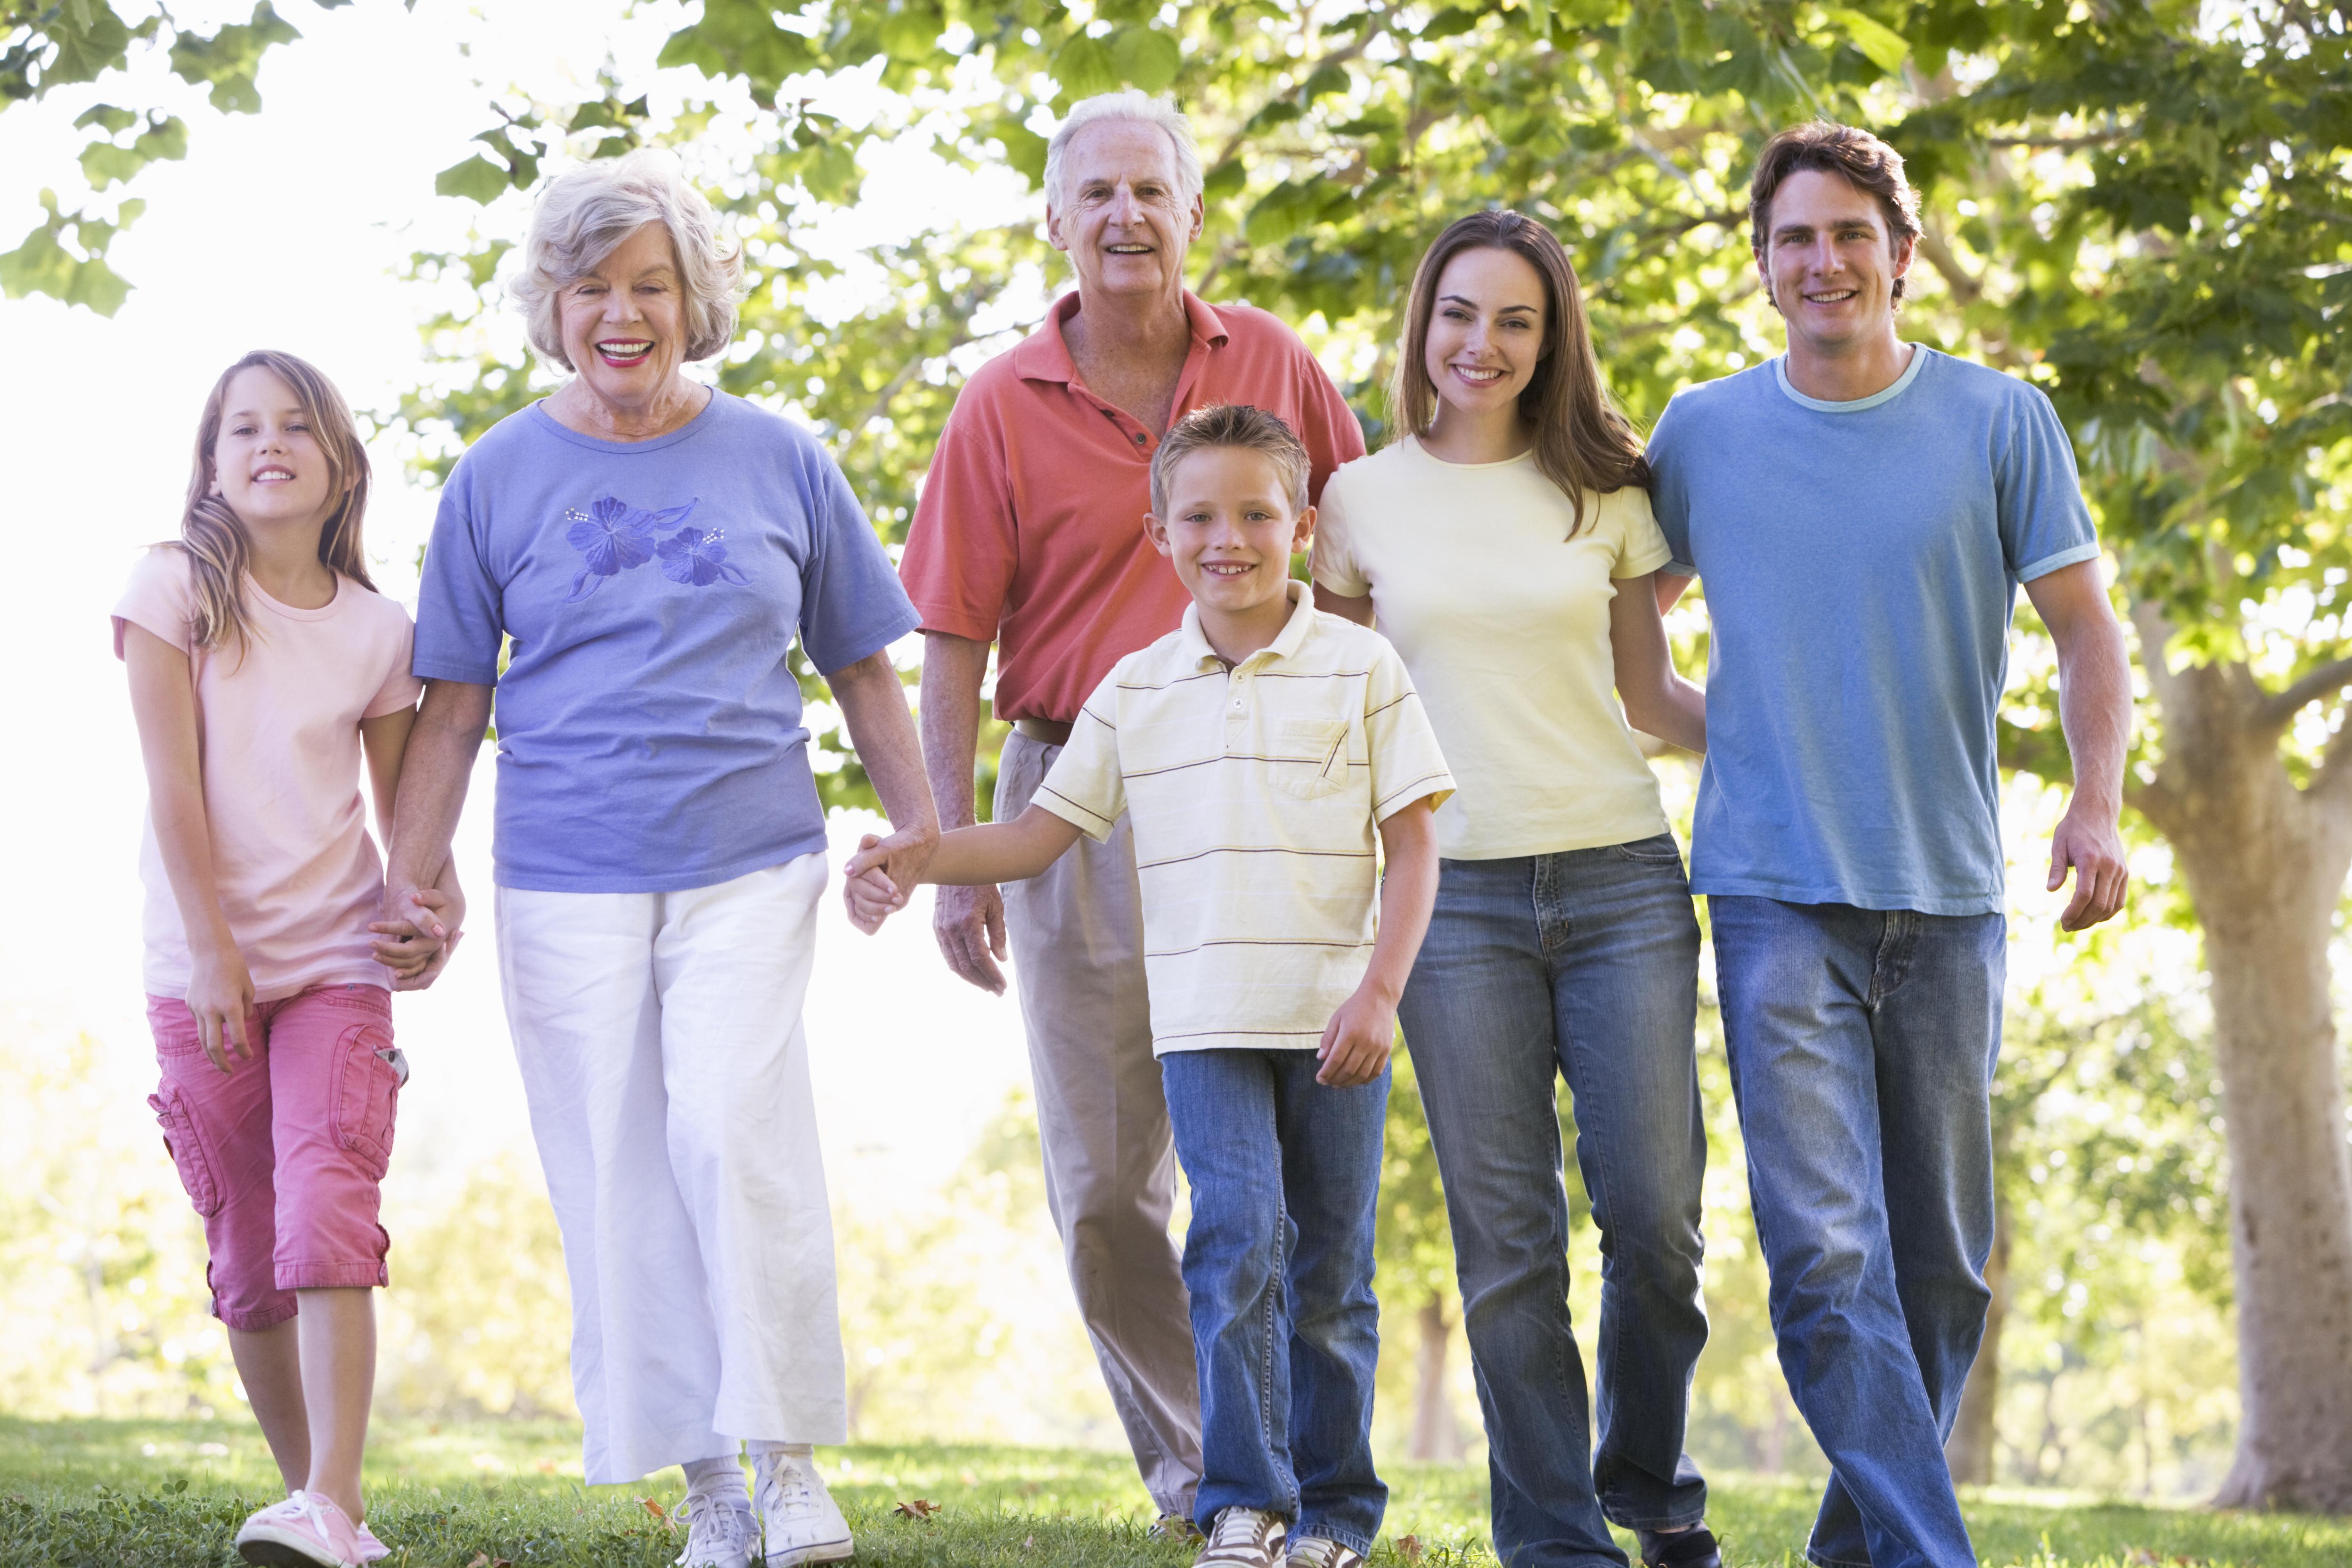 extended-family-walking-in-park-holding-